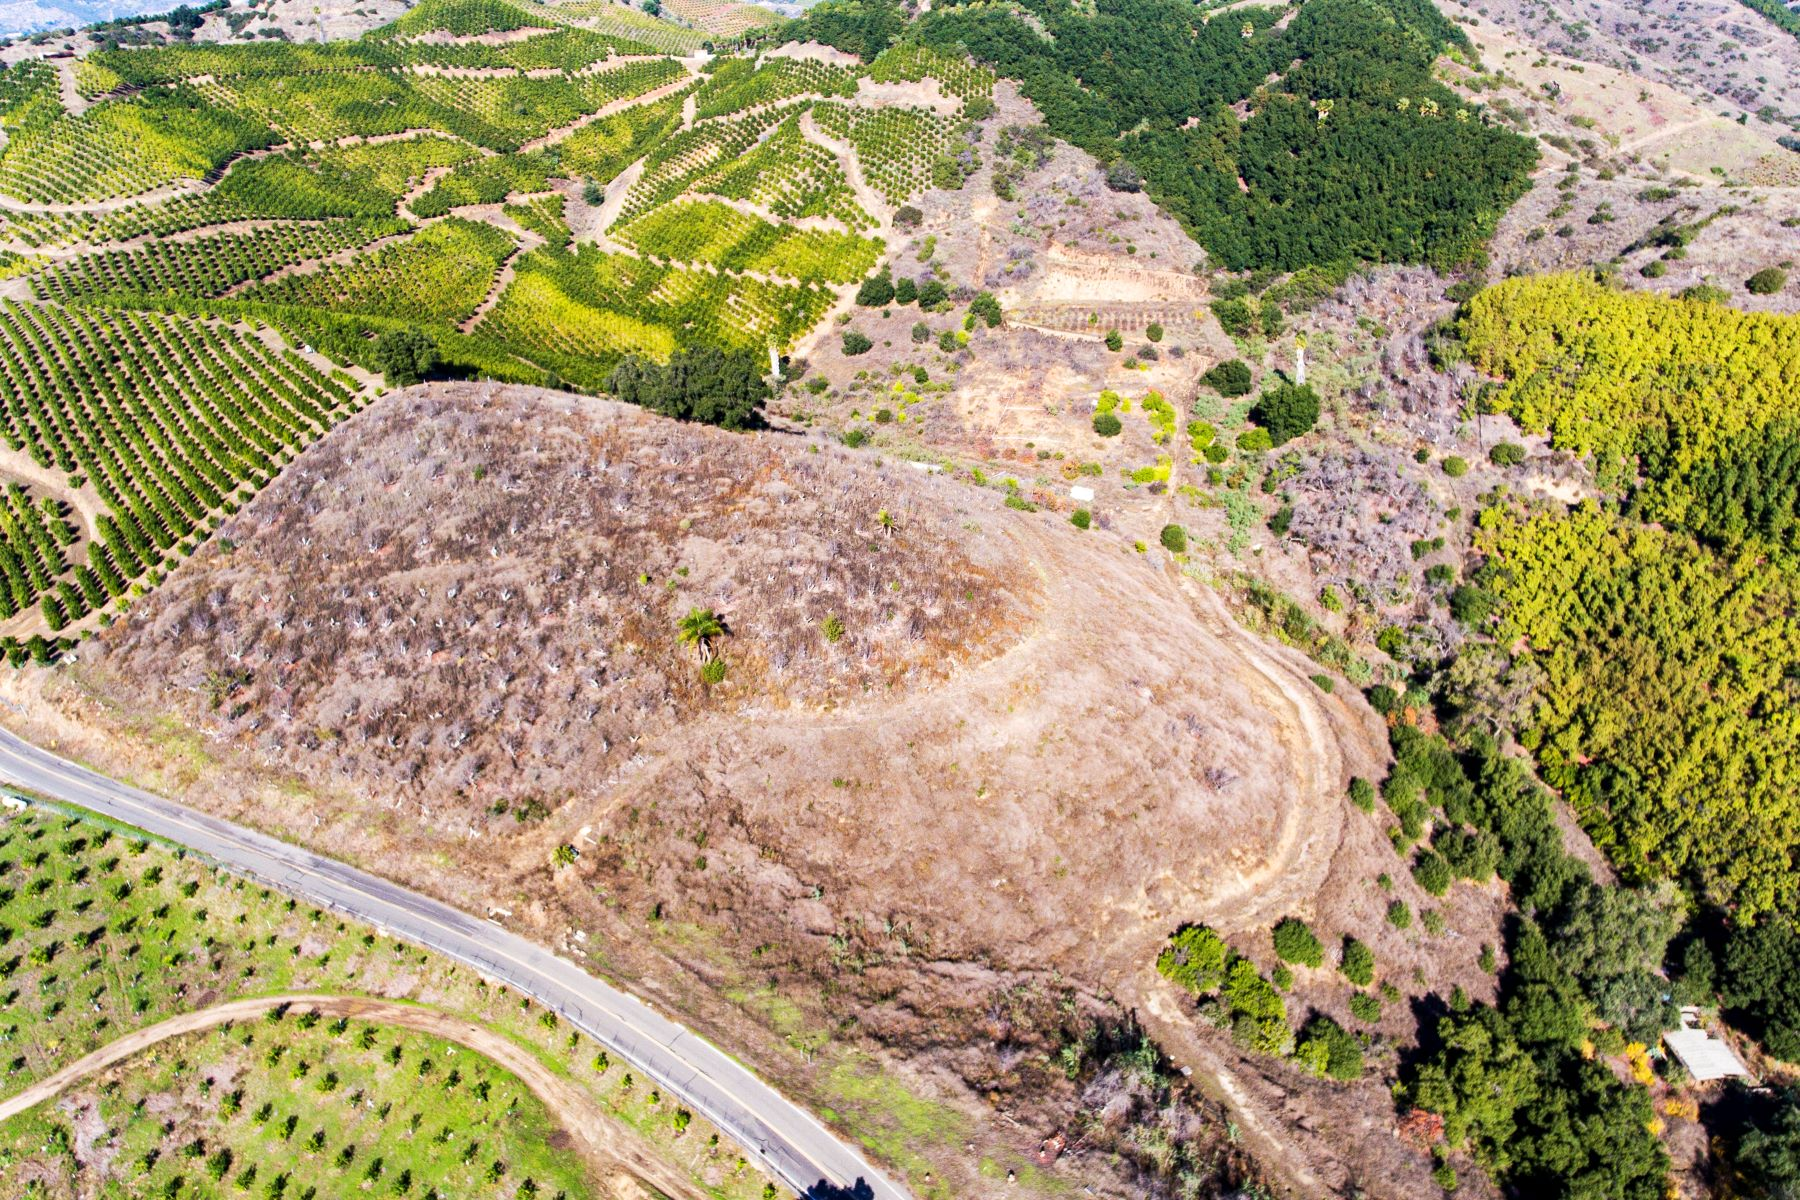 Land for Sale at 46340 Avenida Tierra, Temecula 46340 Avenida Tierra Temecula, California 92590 United States